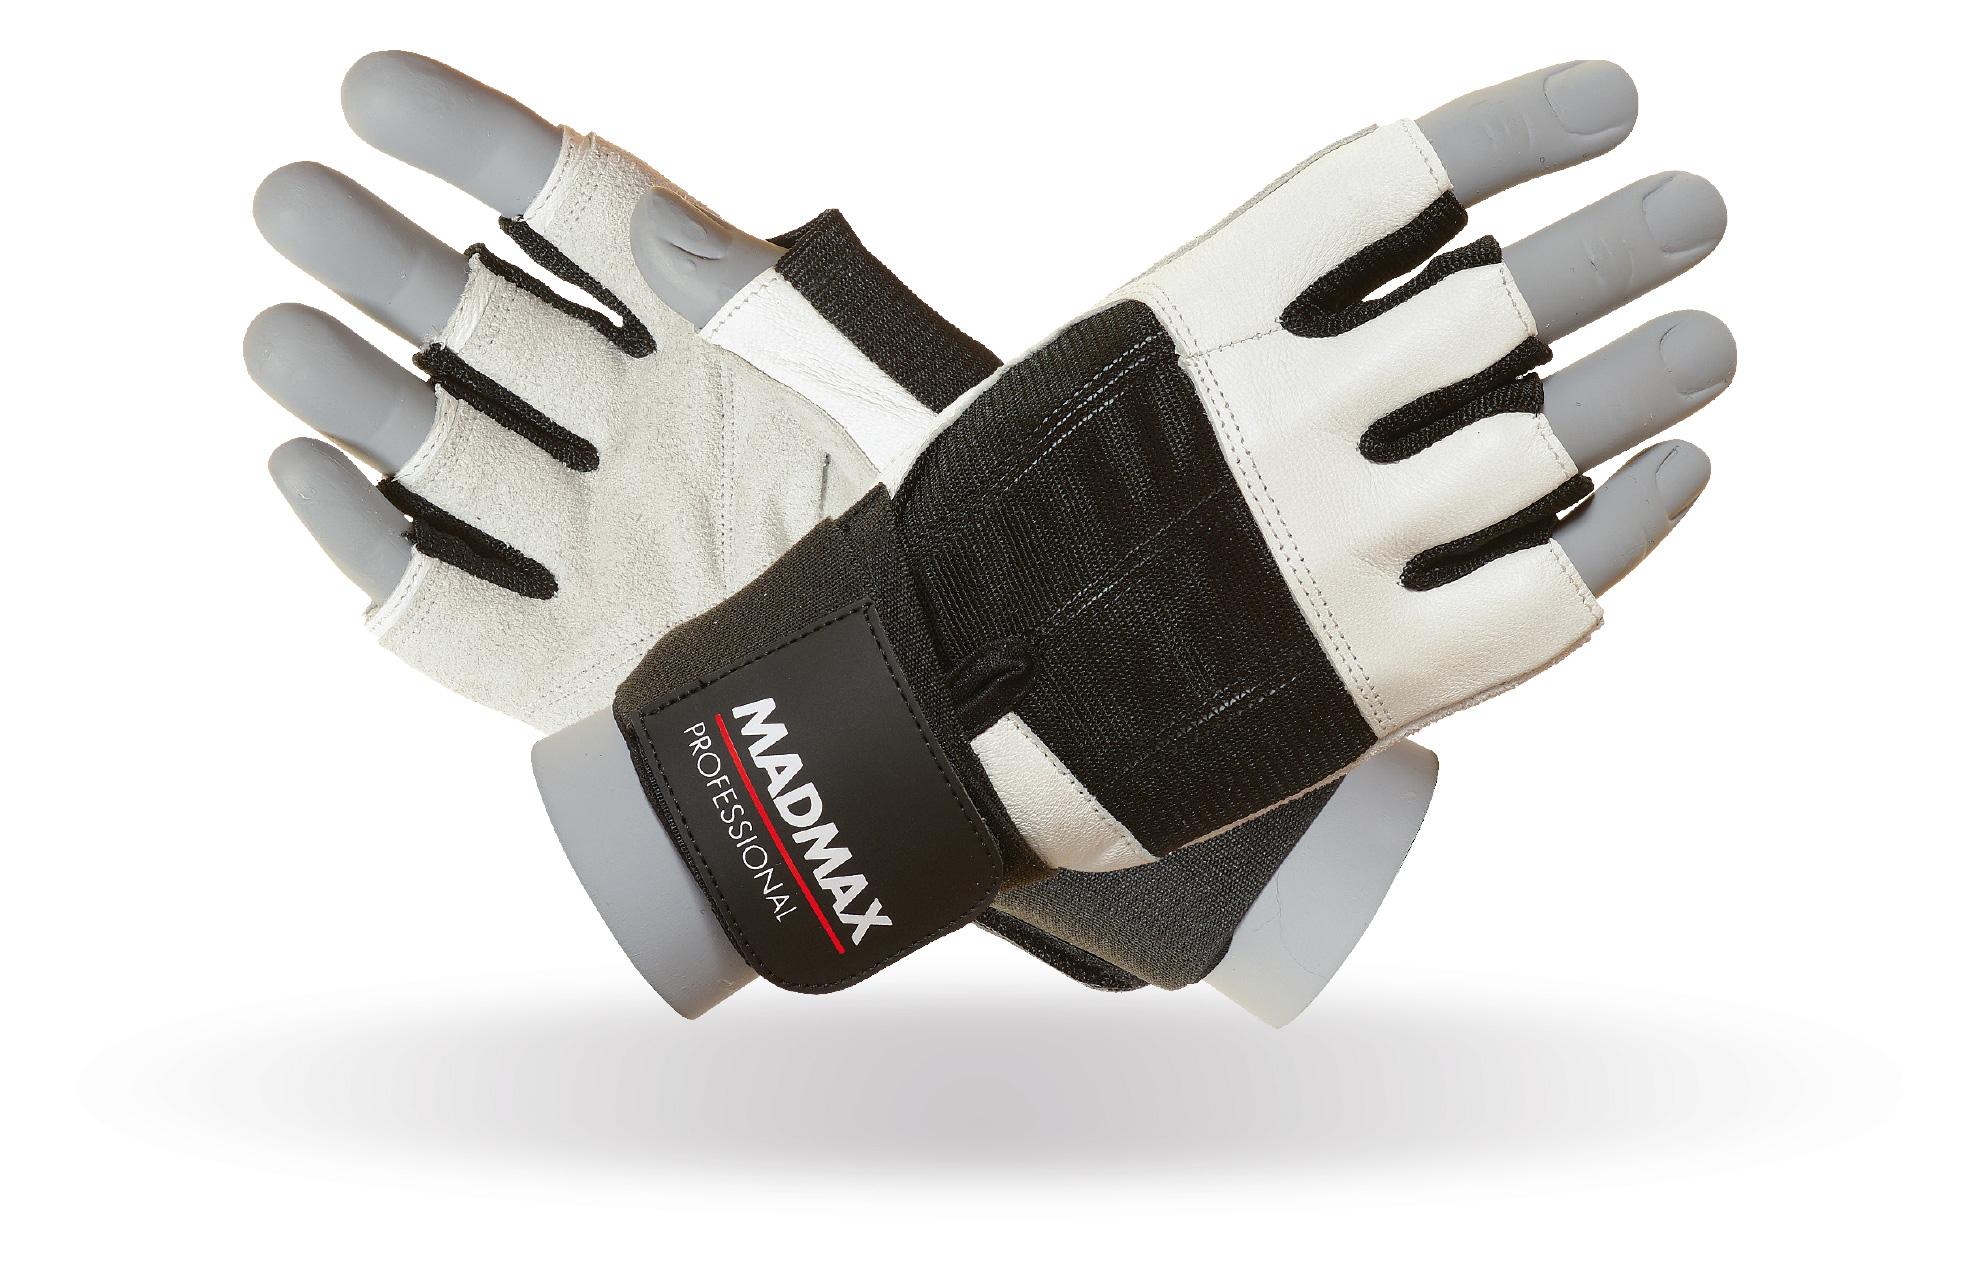 MAD MAX MFG-269 professional white gloves